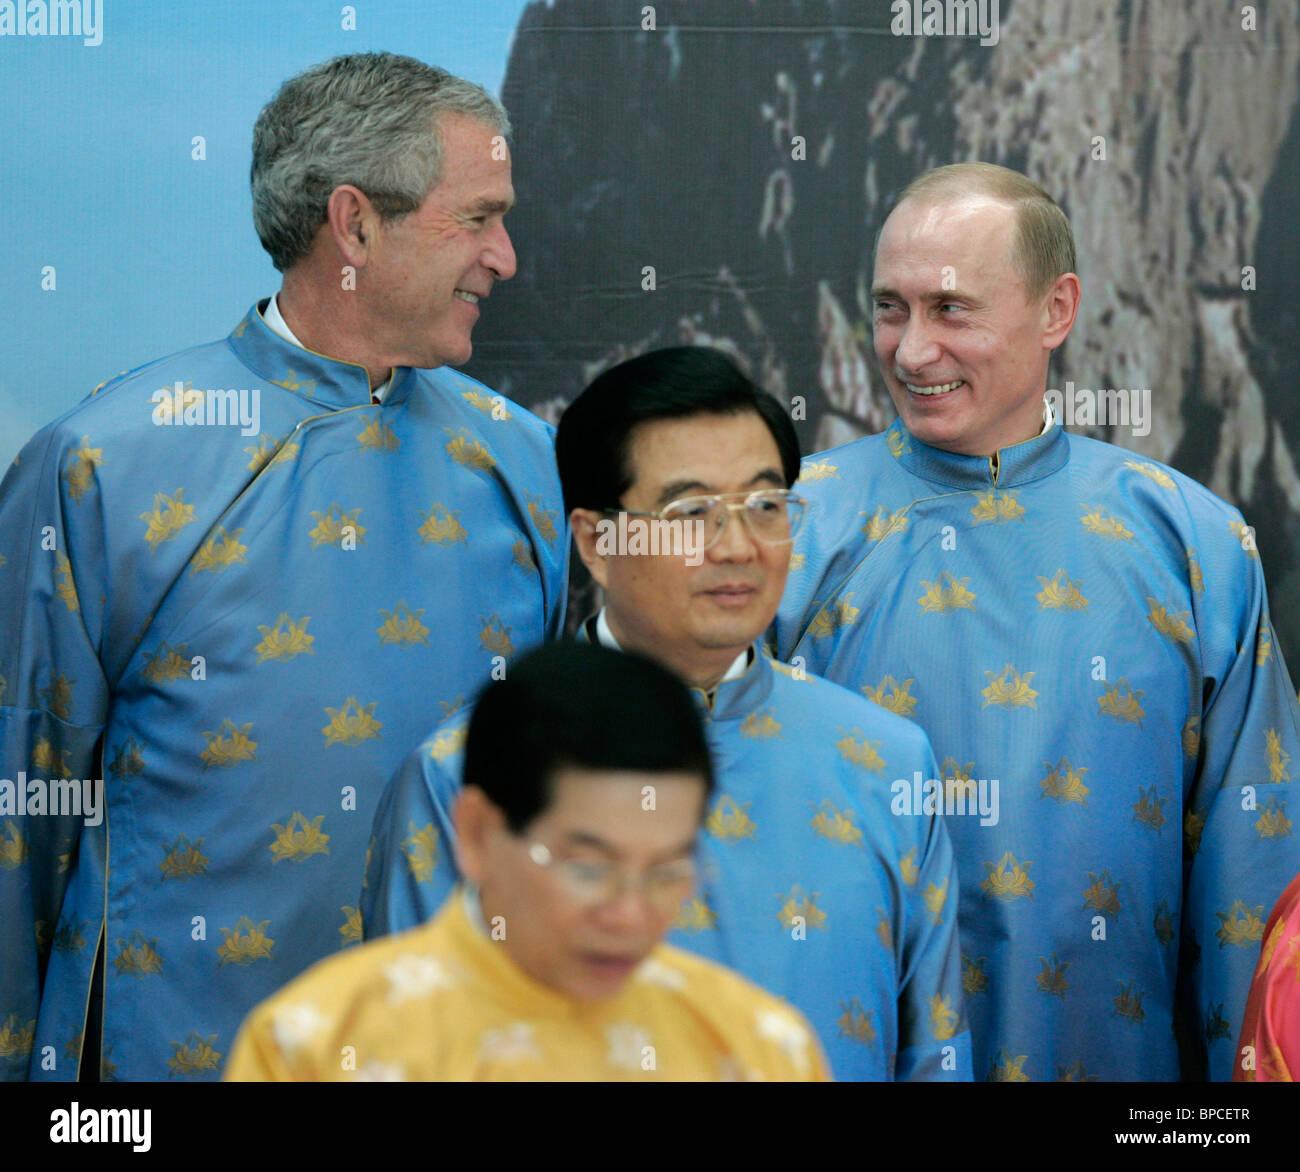 APEC summit in Hanoi: Day 2 - Stock Image